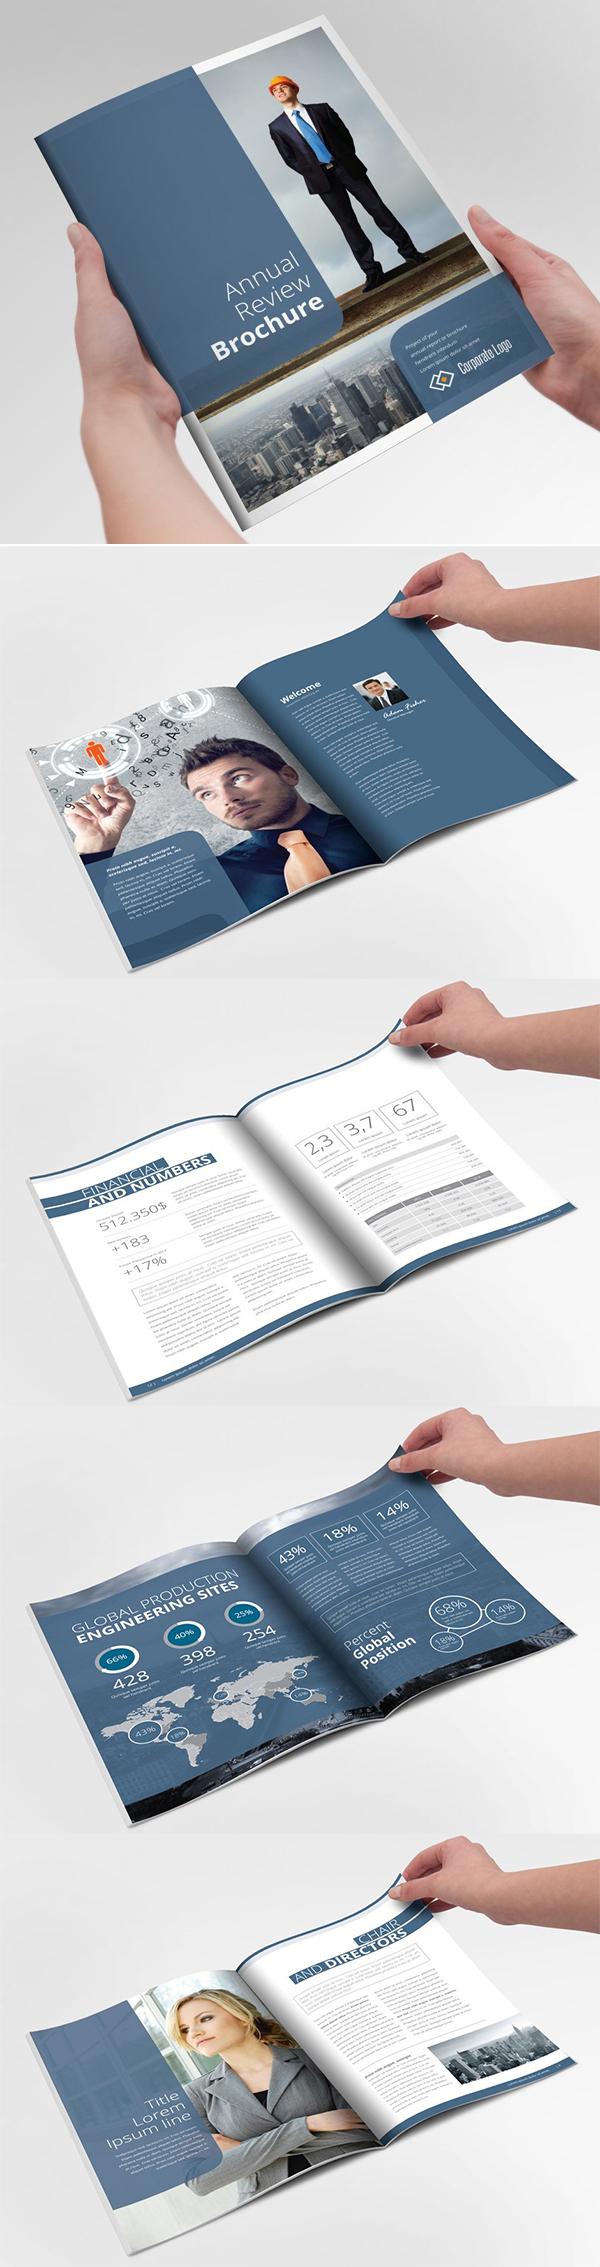 Annual Report Reviev Brochure Template